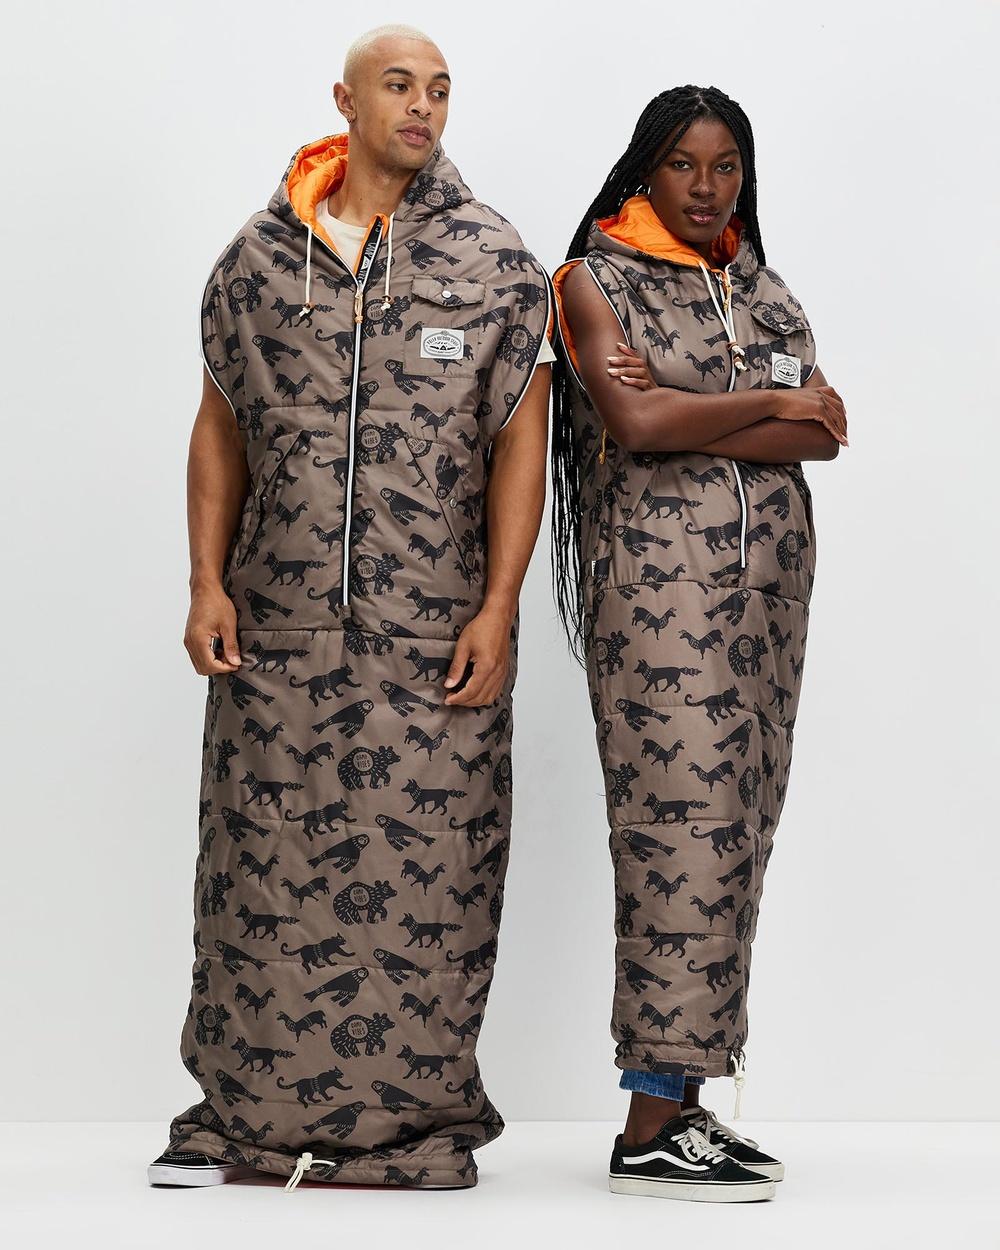 Poler Reversible Napsack Unisex Sleeping Bags & Napsacks Orange Brown Critter